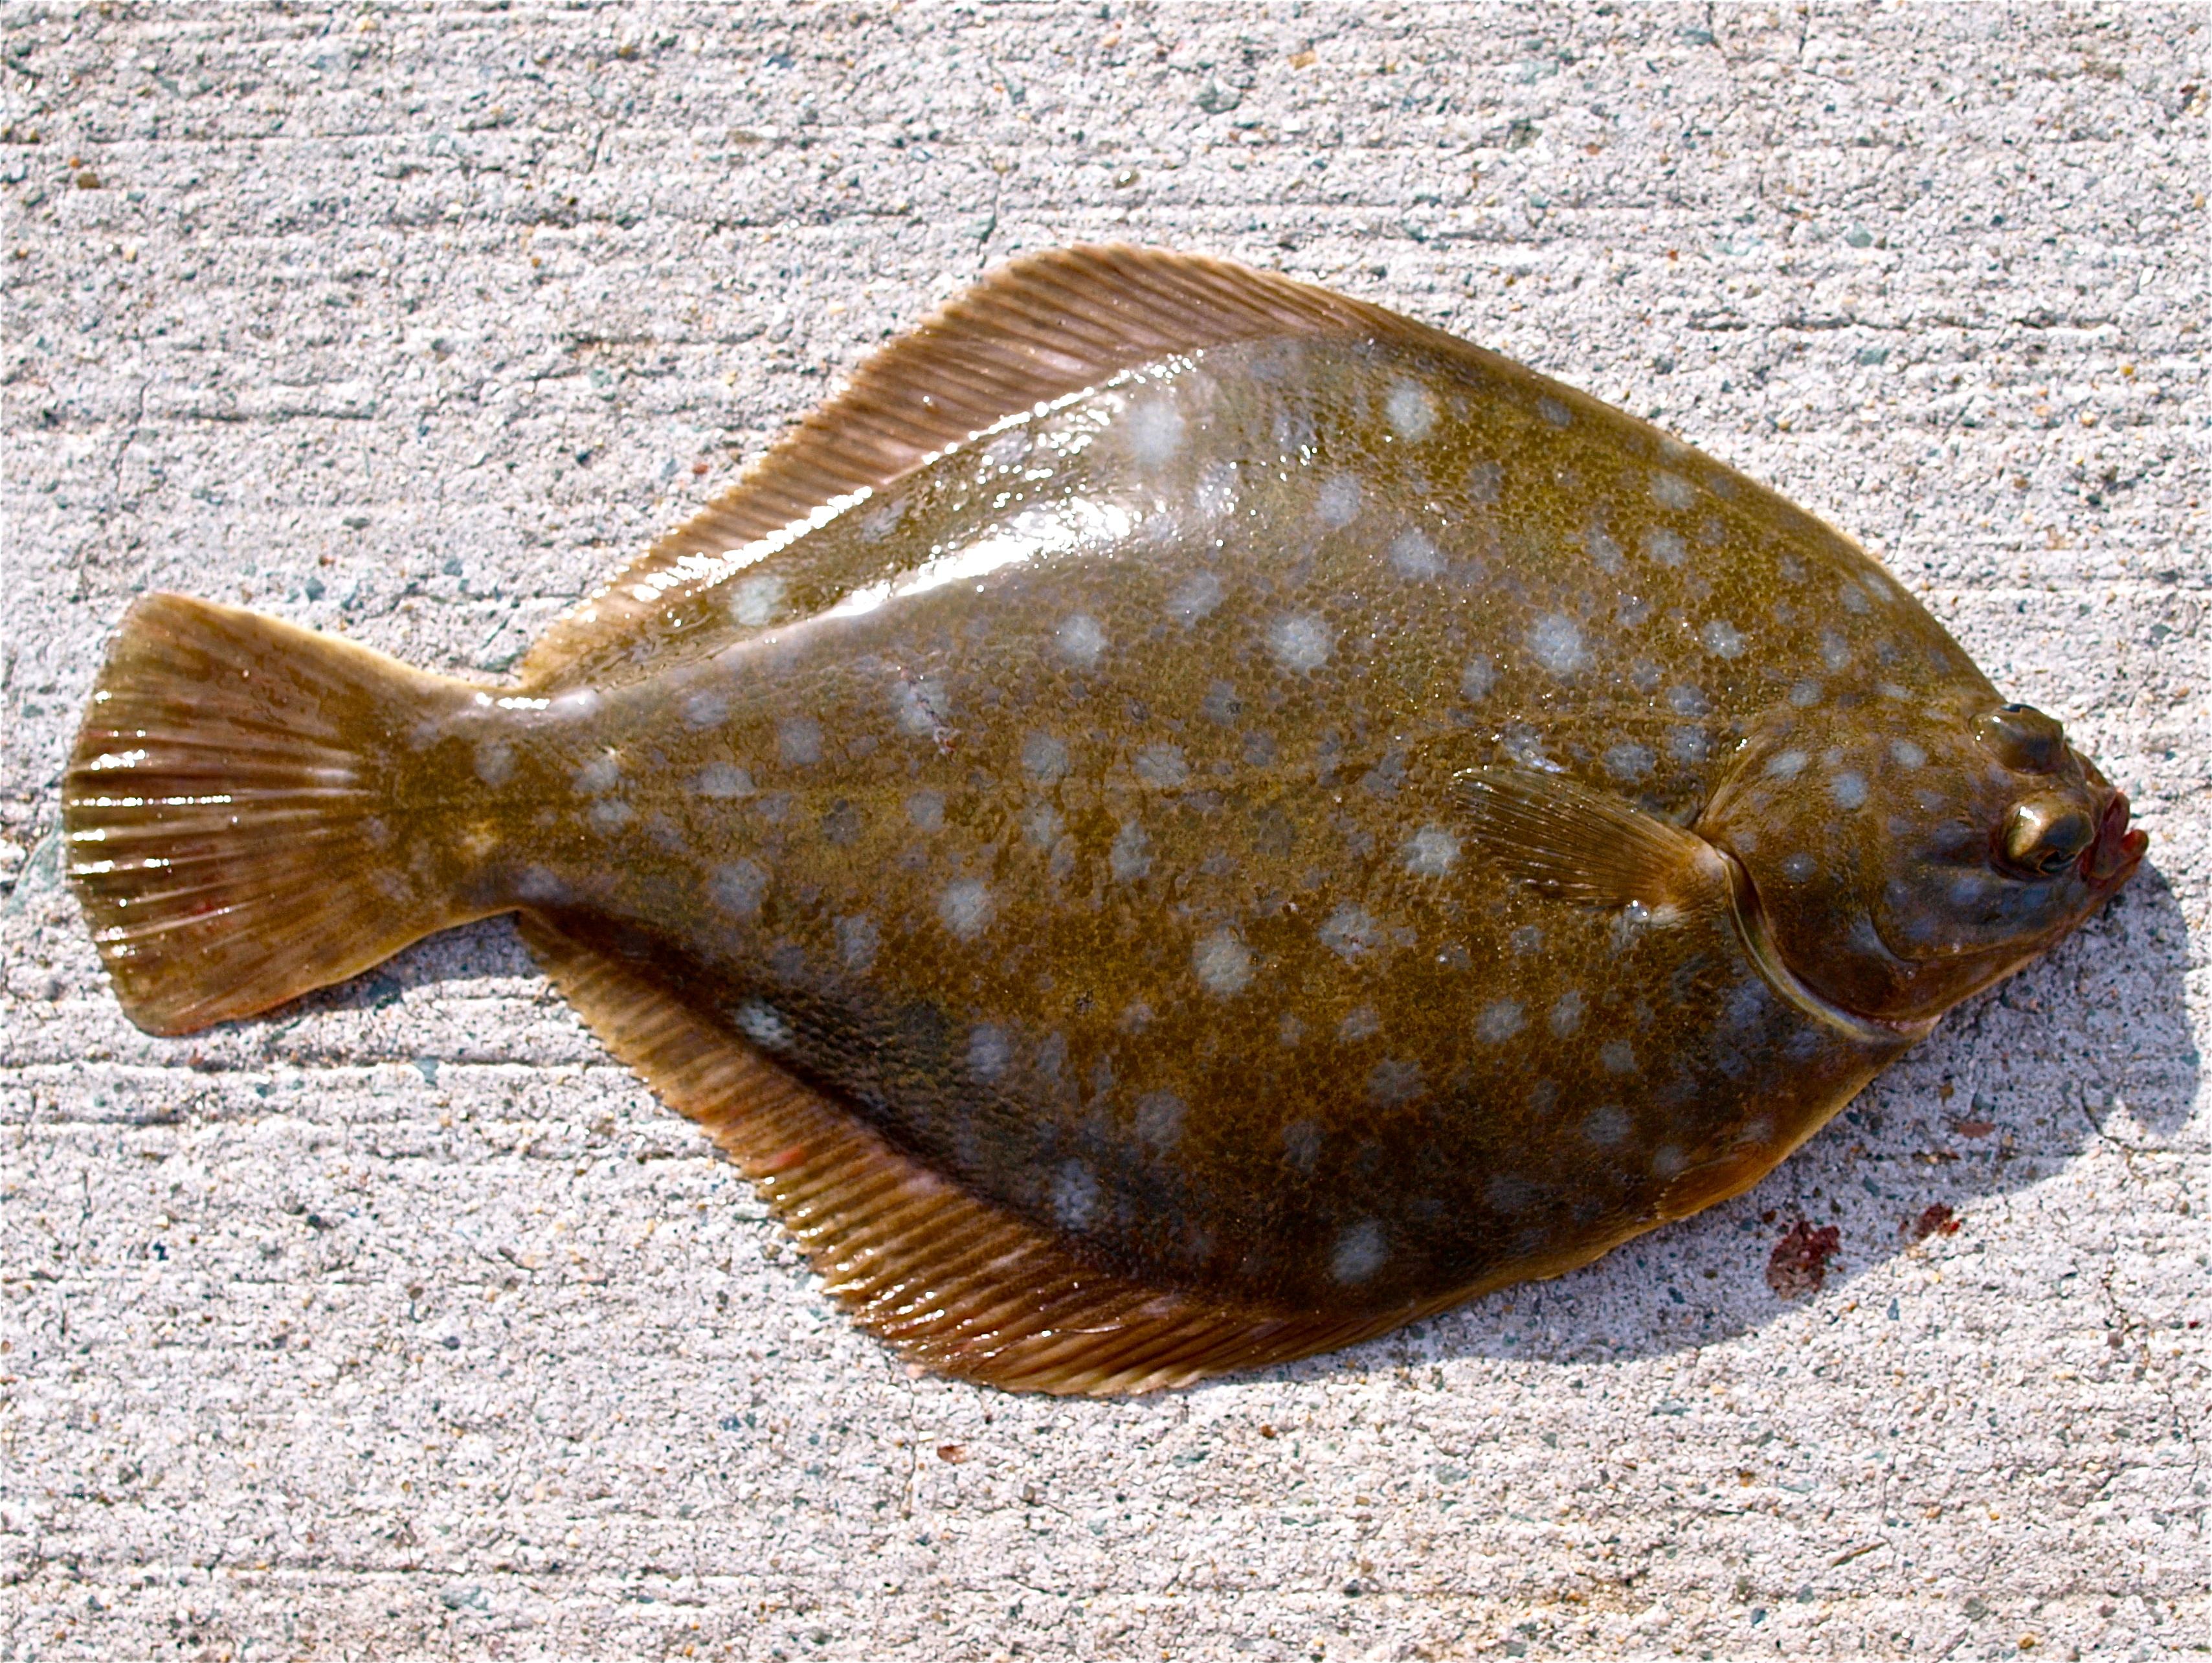 автосервисы рыба тюрбо фото такой наряд